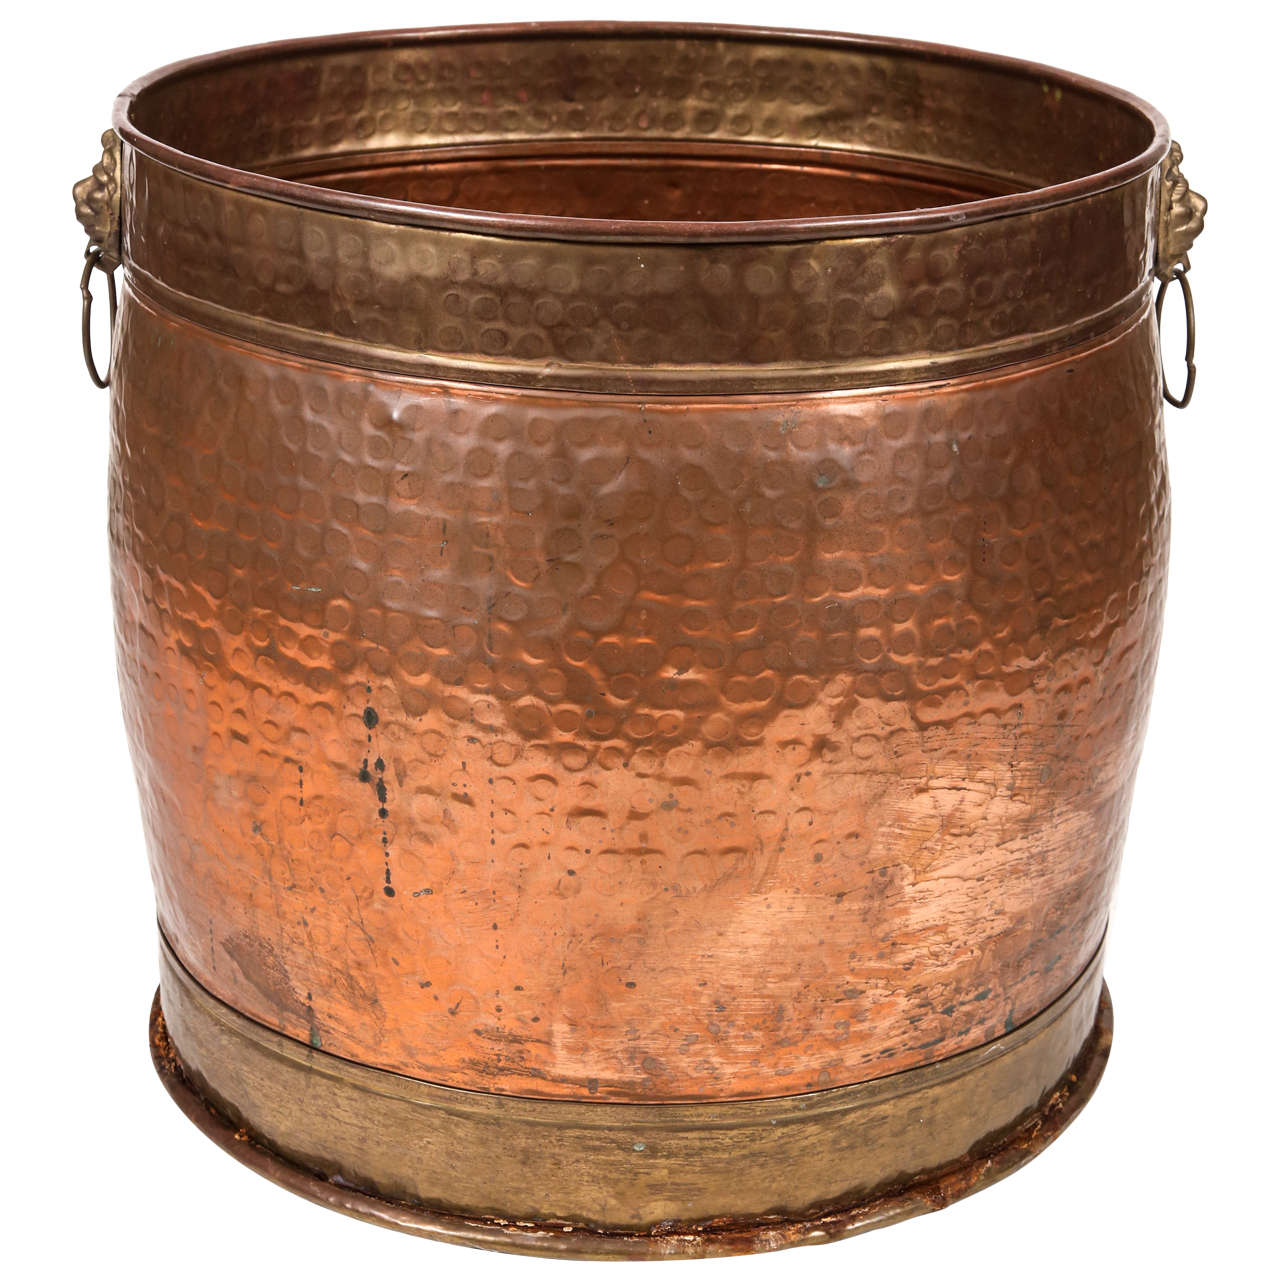 Hammered Copper Pot For Sale At 1stdibs